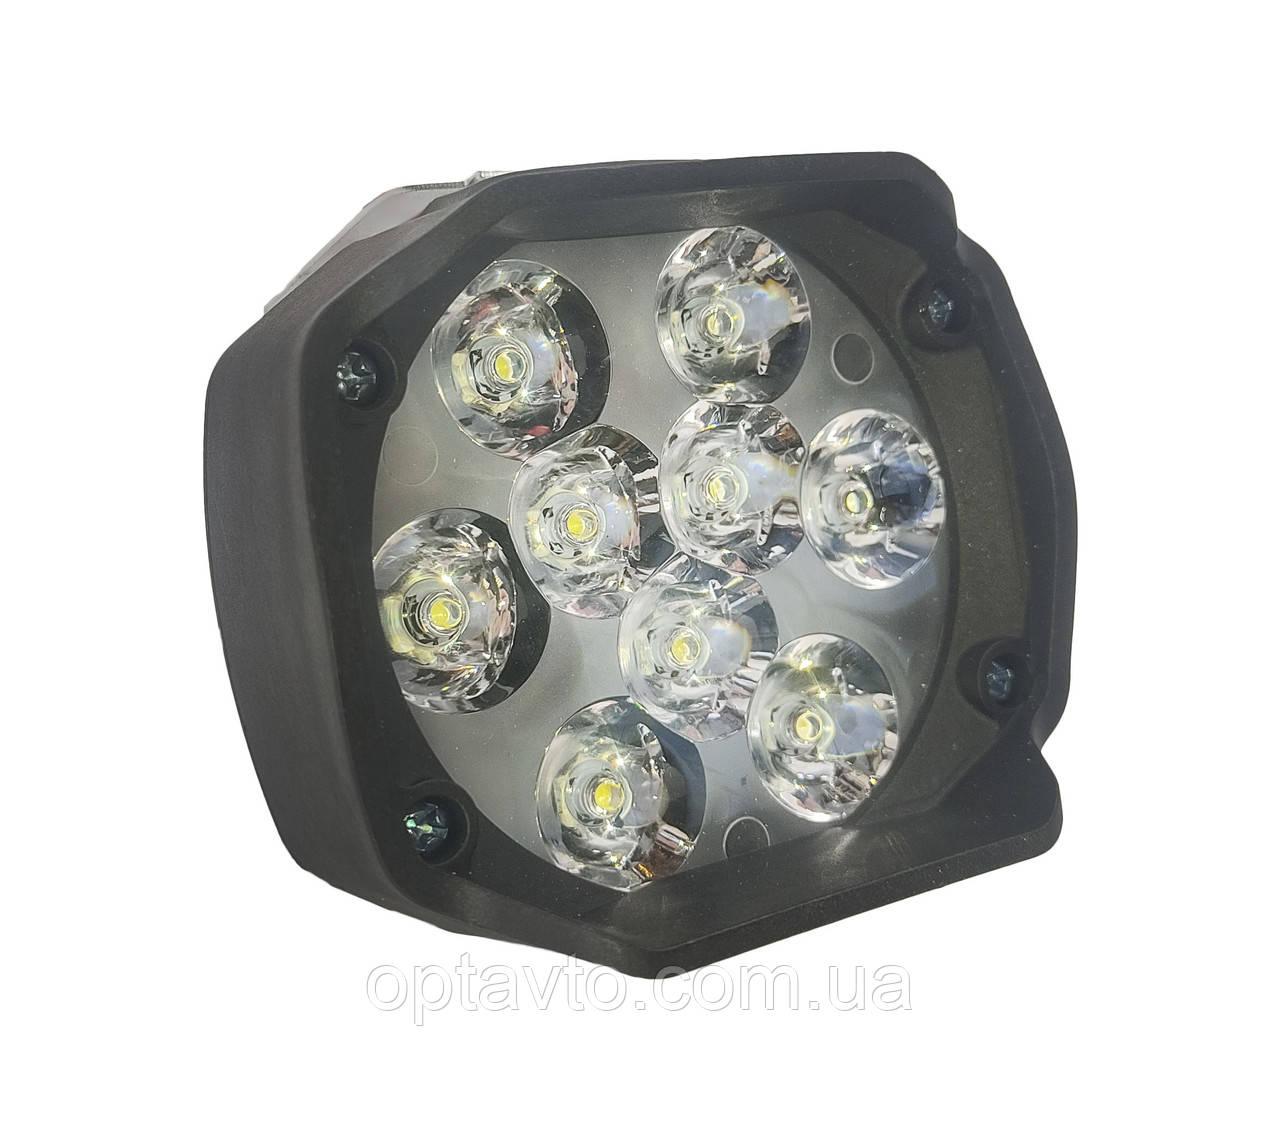 LED фары ОПТОМ от 2-х штук! Светодиодная лэд фара на 9 диодов. DC 9-85v, 15w.